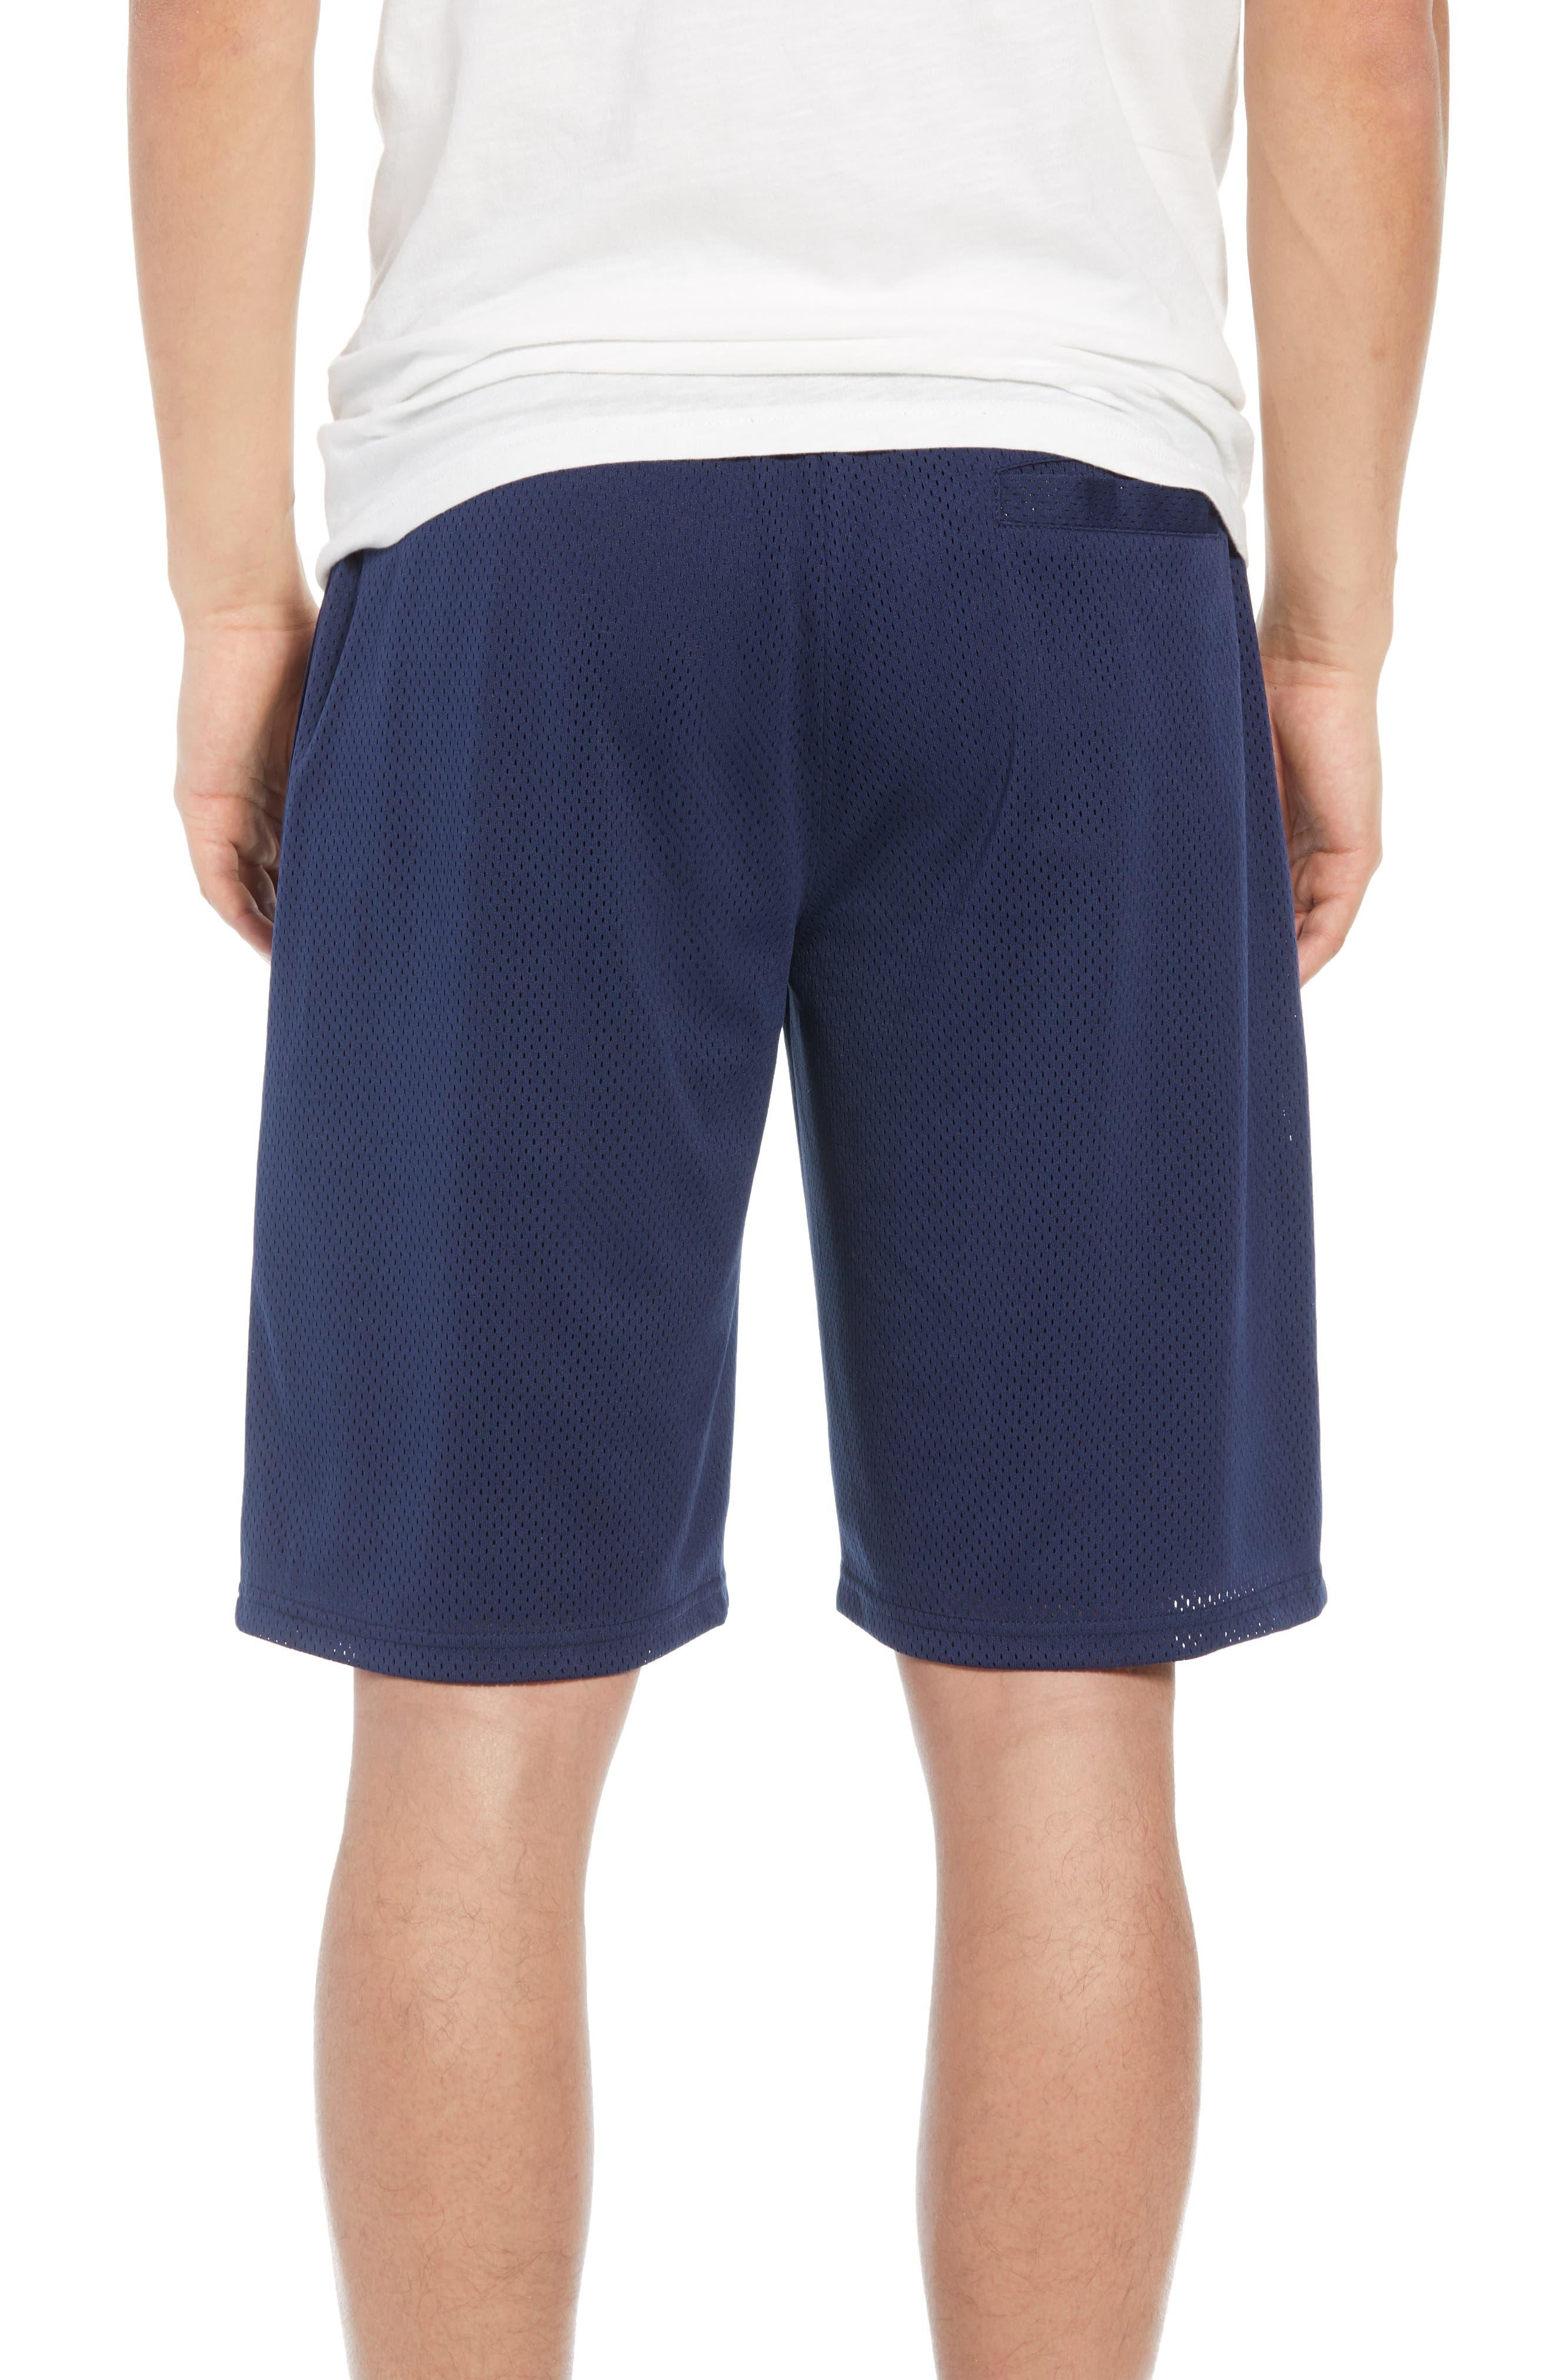 Basketball Shorts,                             Alternate thumbnail 2, color,                             NAVY PEACOAT